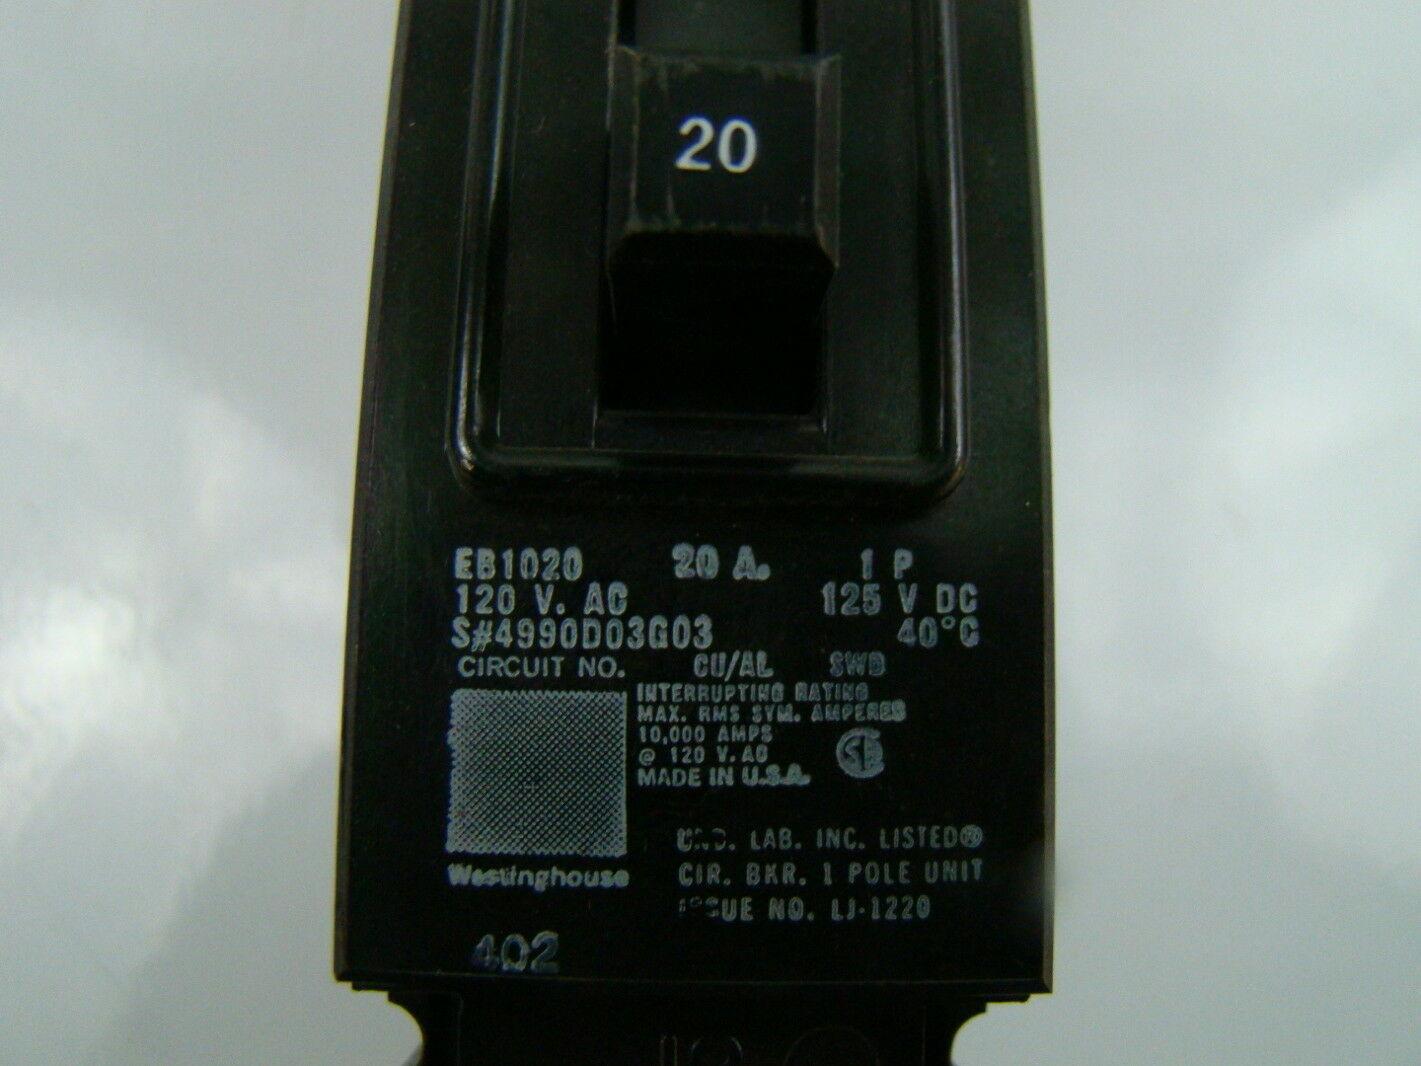 Fine Bulldog Security Wiring Small Dimarzio Switch Rectangular Car Alarm Wiring 4pdt Switch Wiring Youthful Guitar Tone Wiring RedDiagram Of Solar Panel 120v Circuit   Dolgular